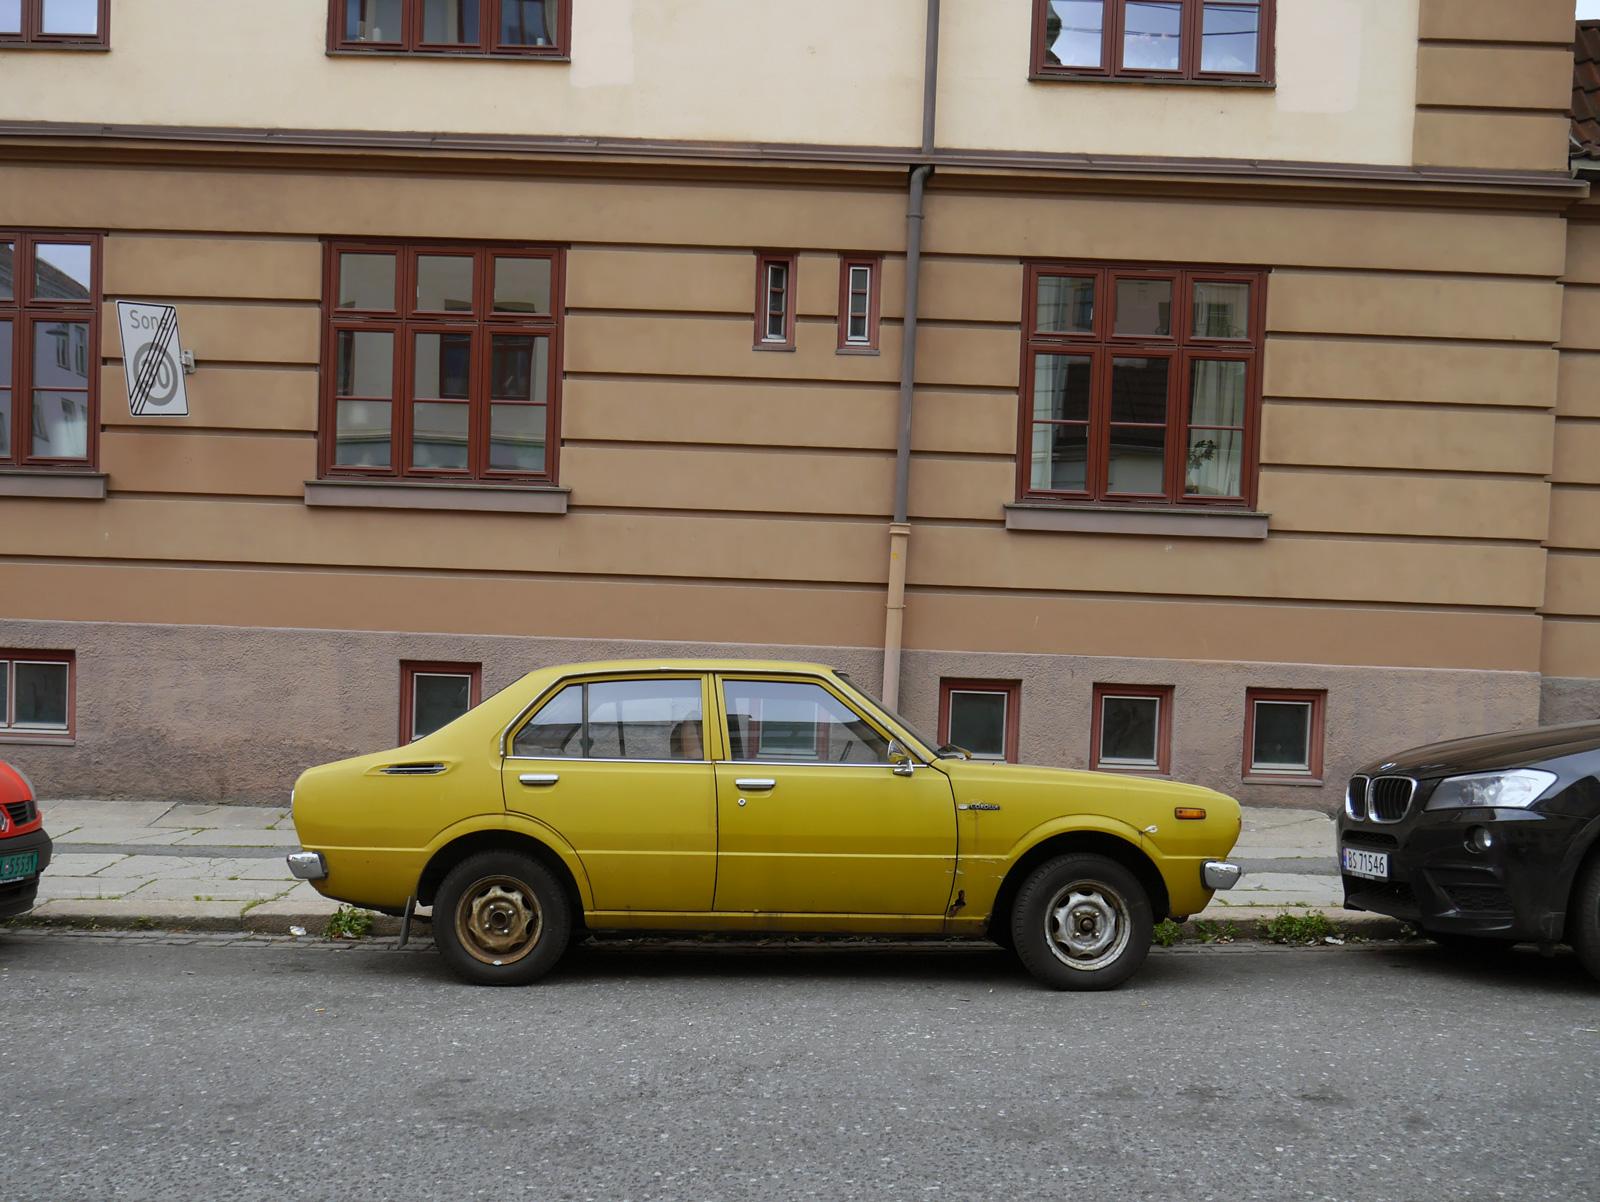 1976 Toyota Coralla Deluxe E30 Japanese classic cars Oslo Norway